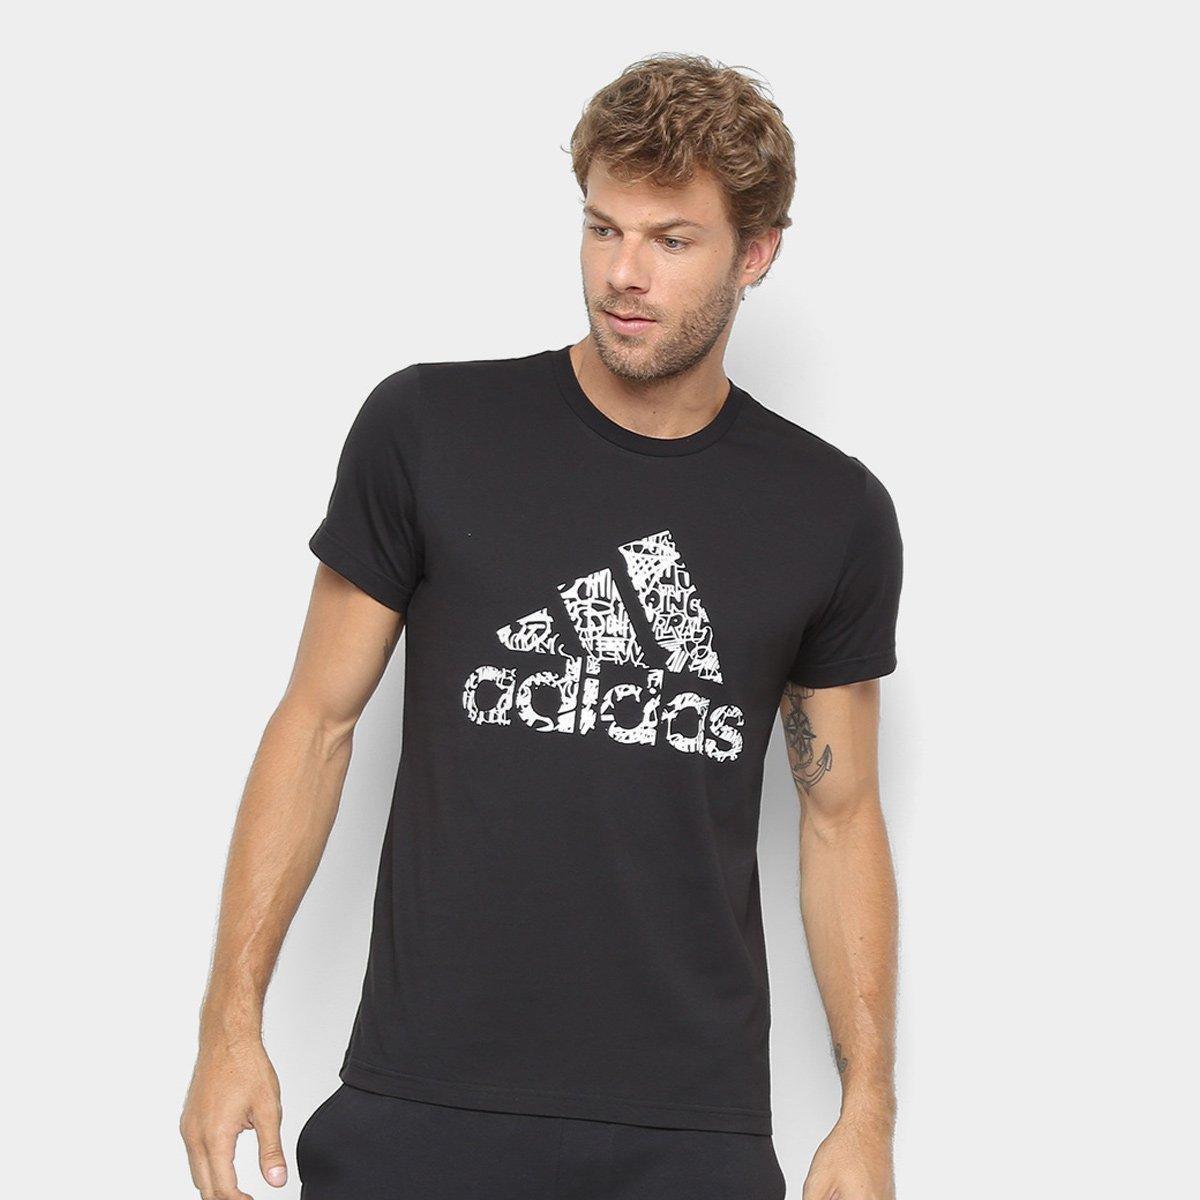 Camiseta Adidas Badge of Sports Masculina - Preto - Compre Agora ... 0482e933ad7